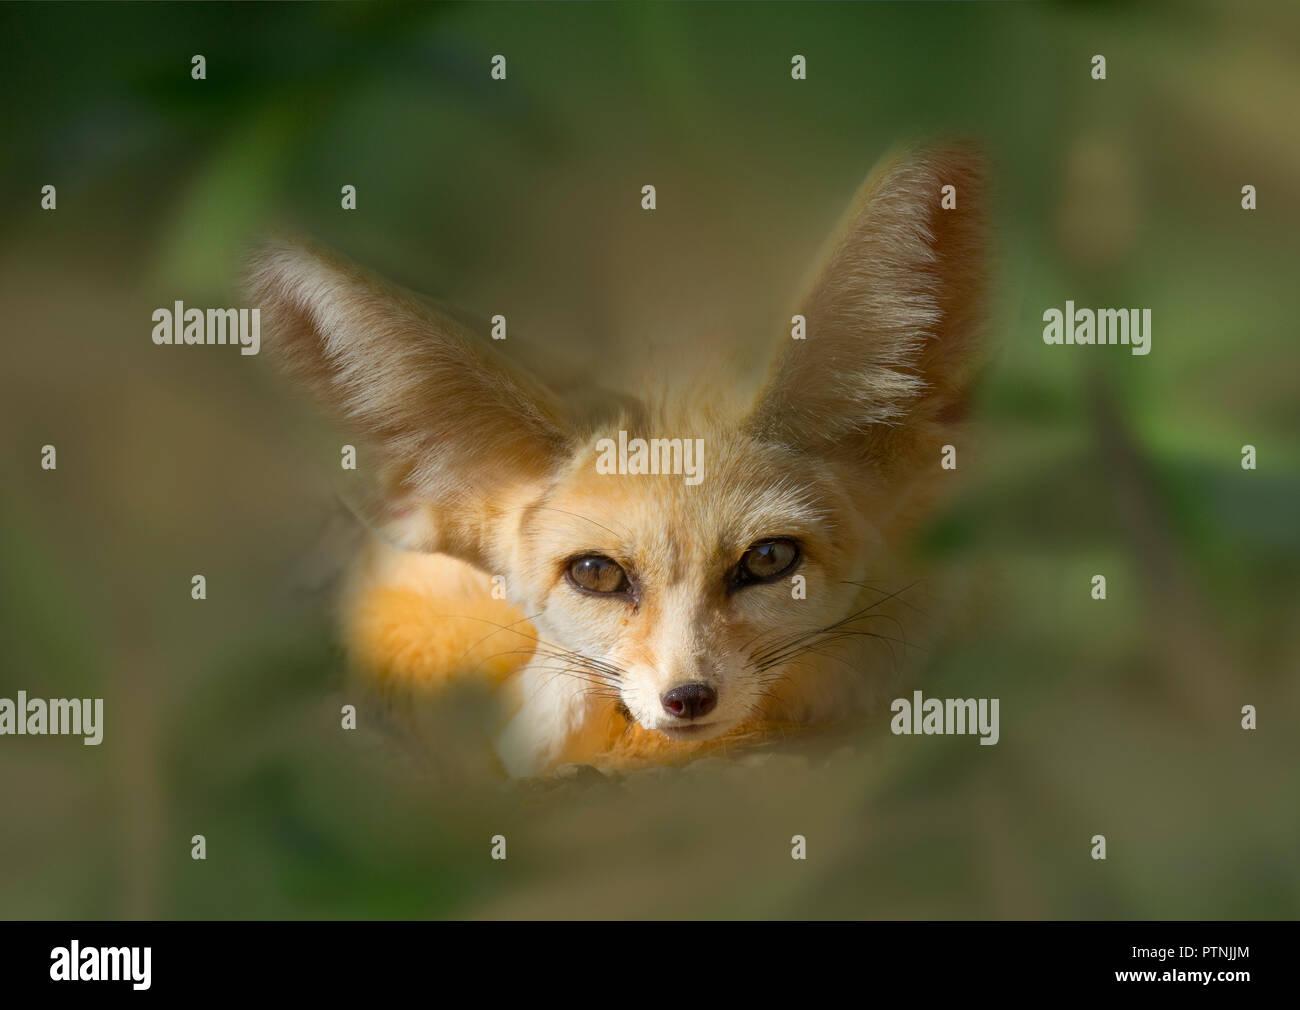 Fennec fox Vulpes zerda sleeping Captive photograph - Stock Image